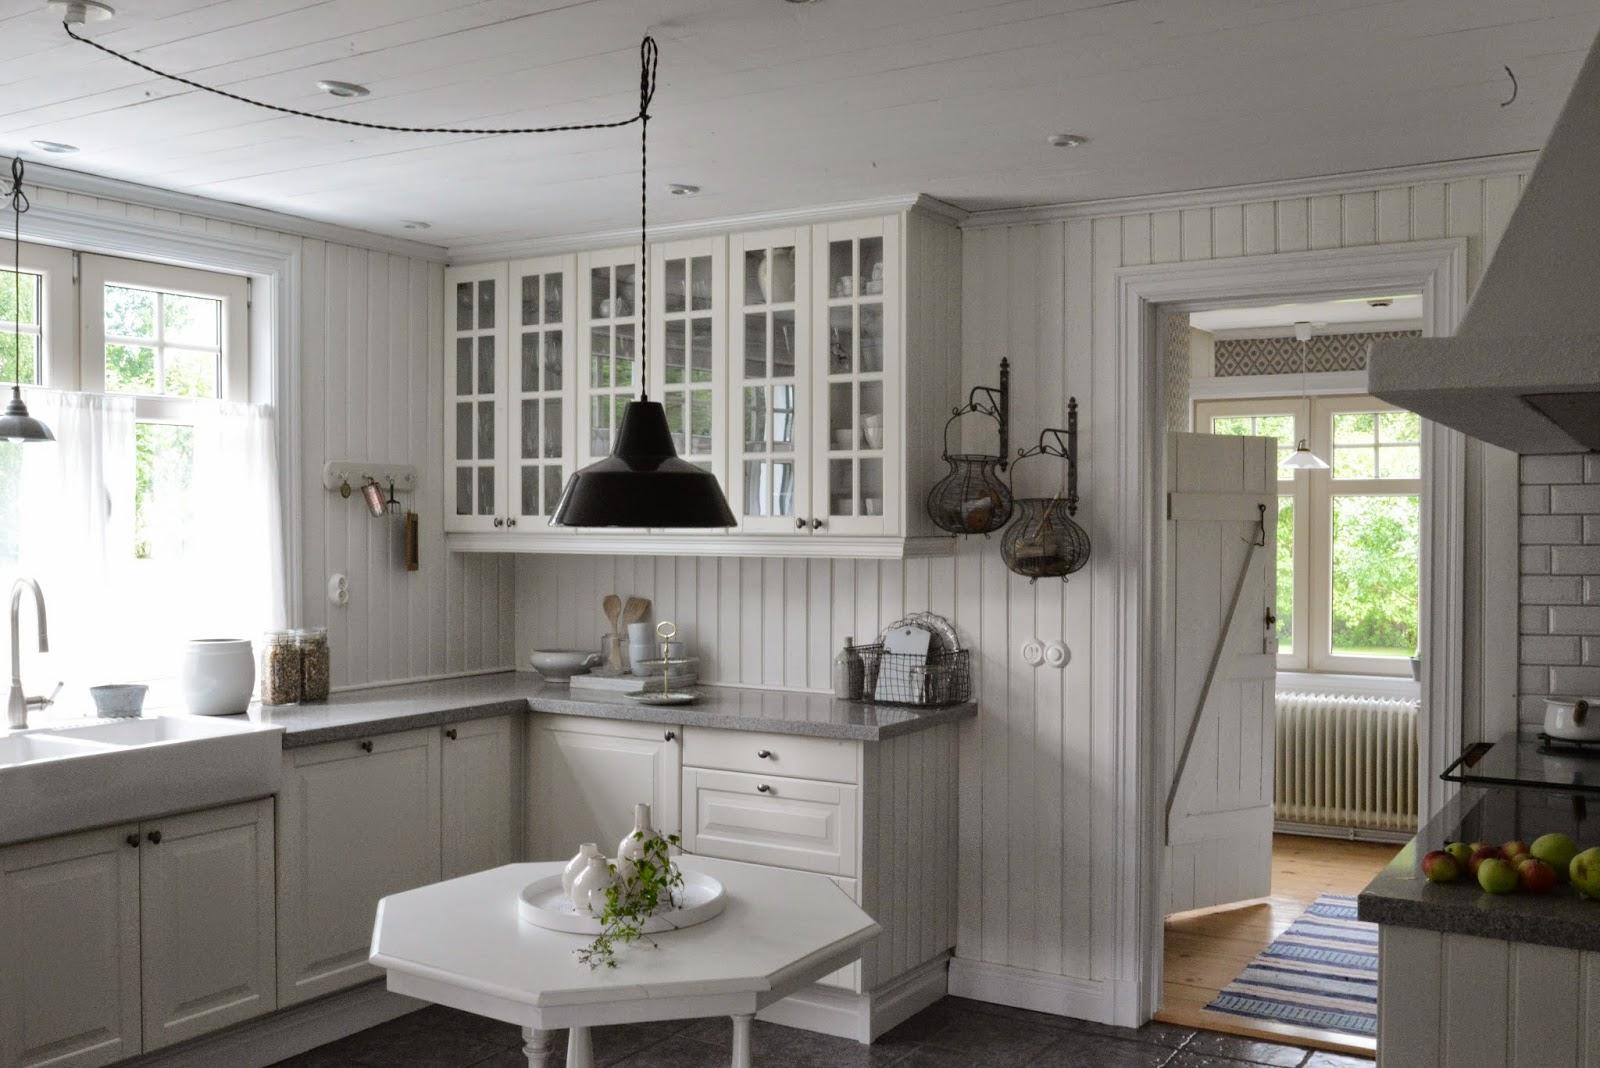 Kok Lantligt Ikea : add design  anna stenberg  lantligt po svanongen Lantligt kok!